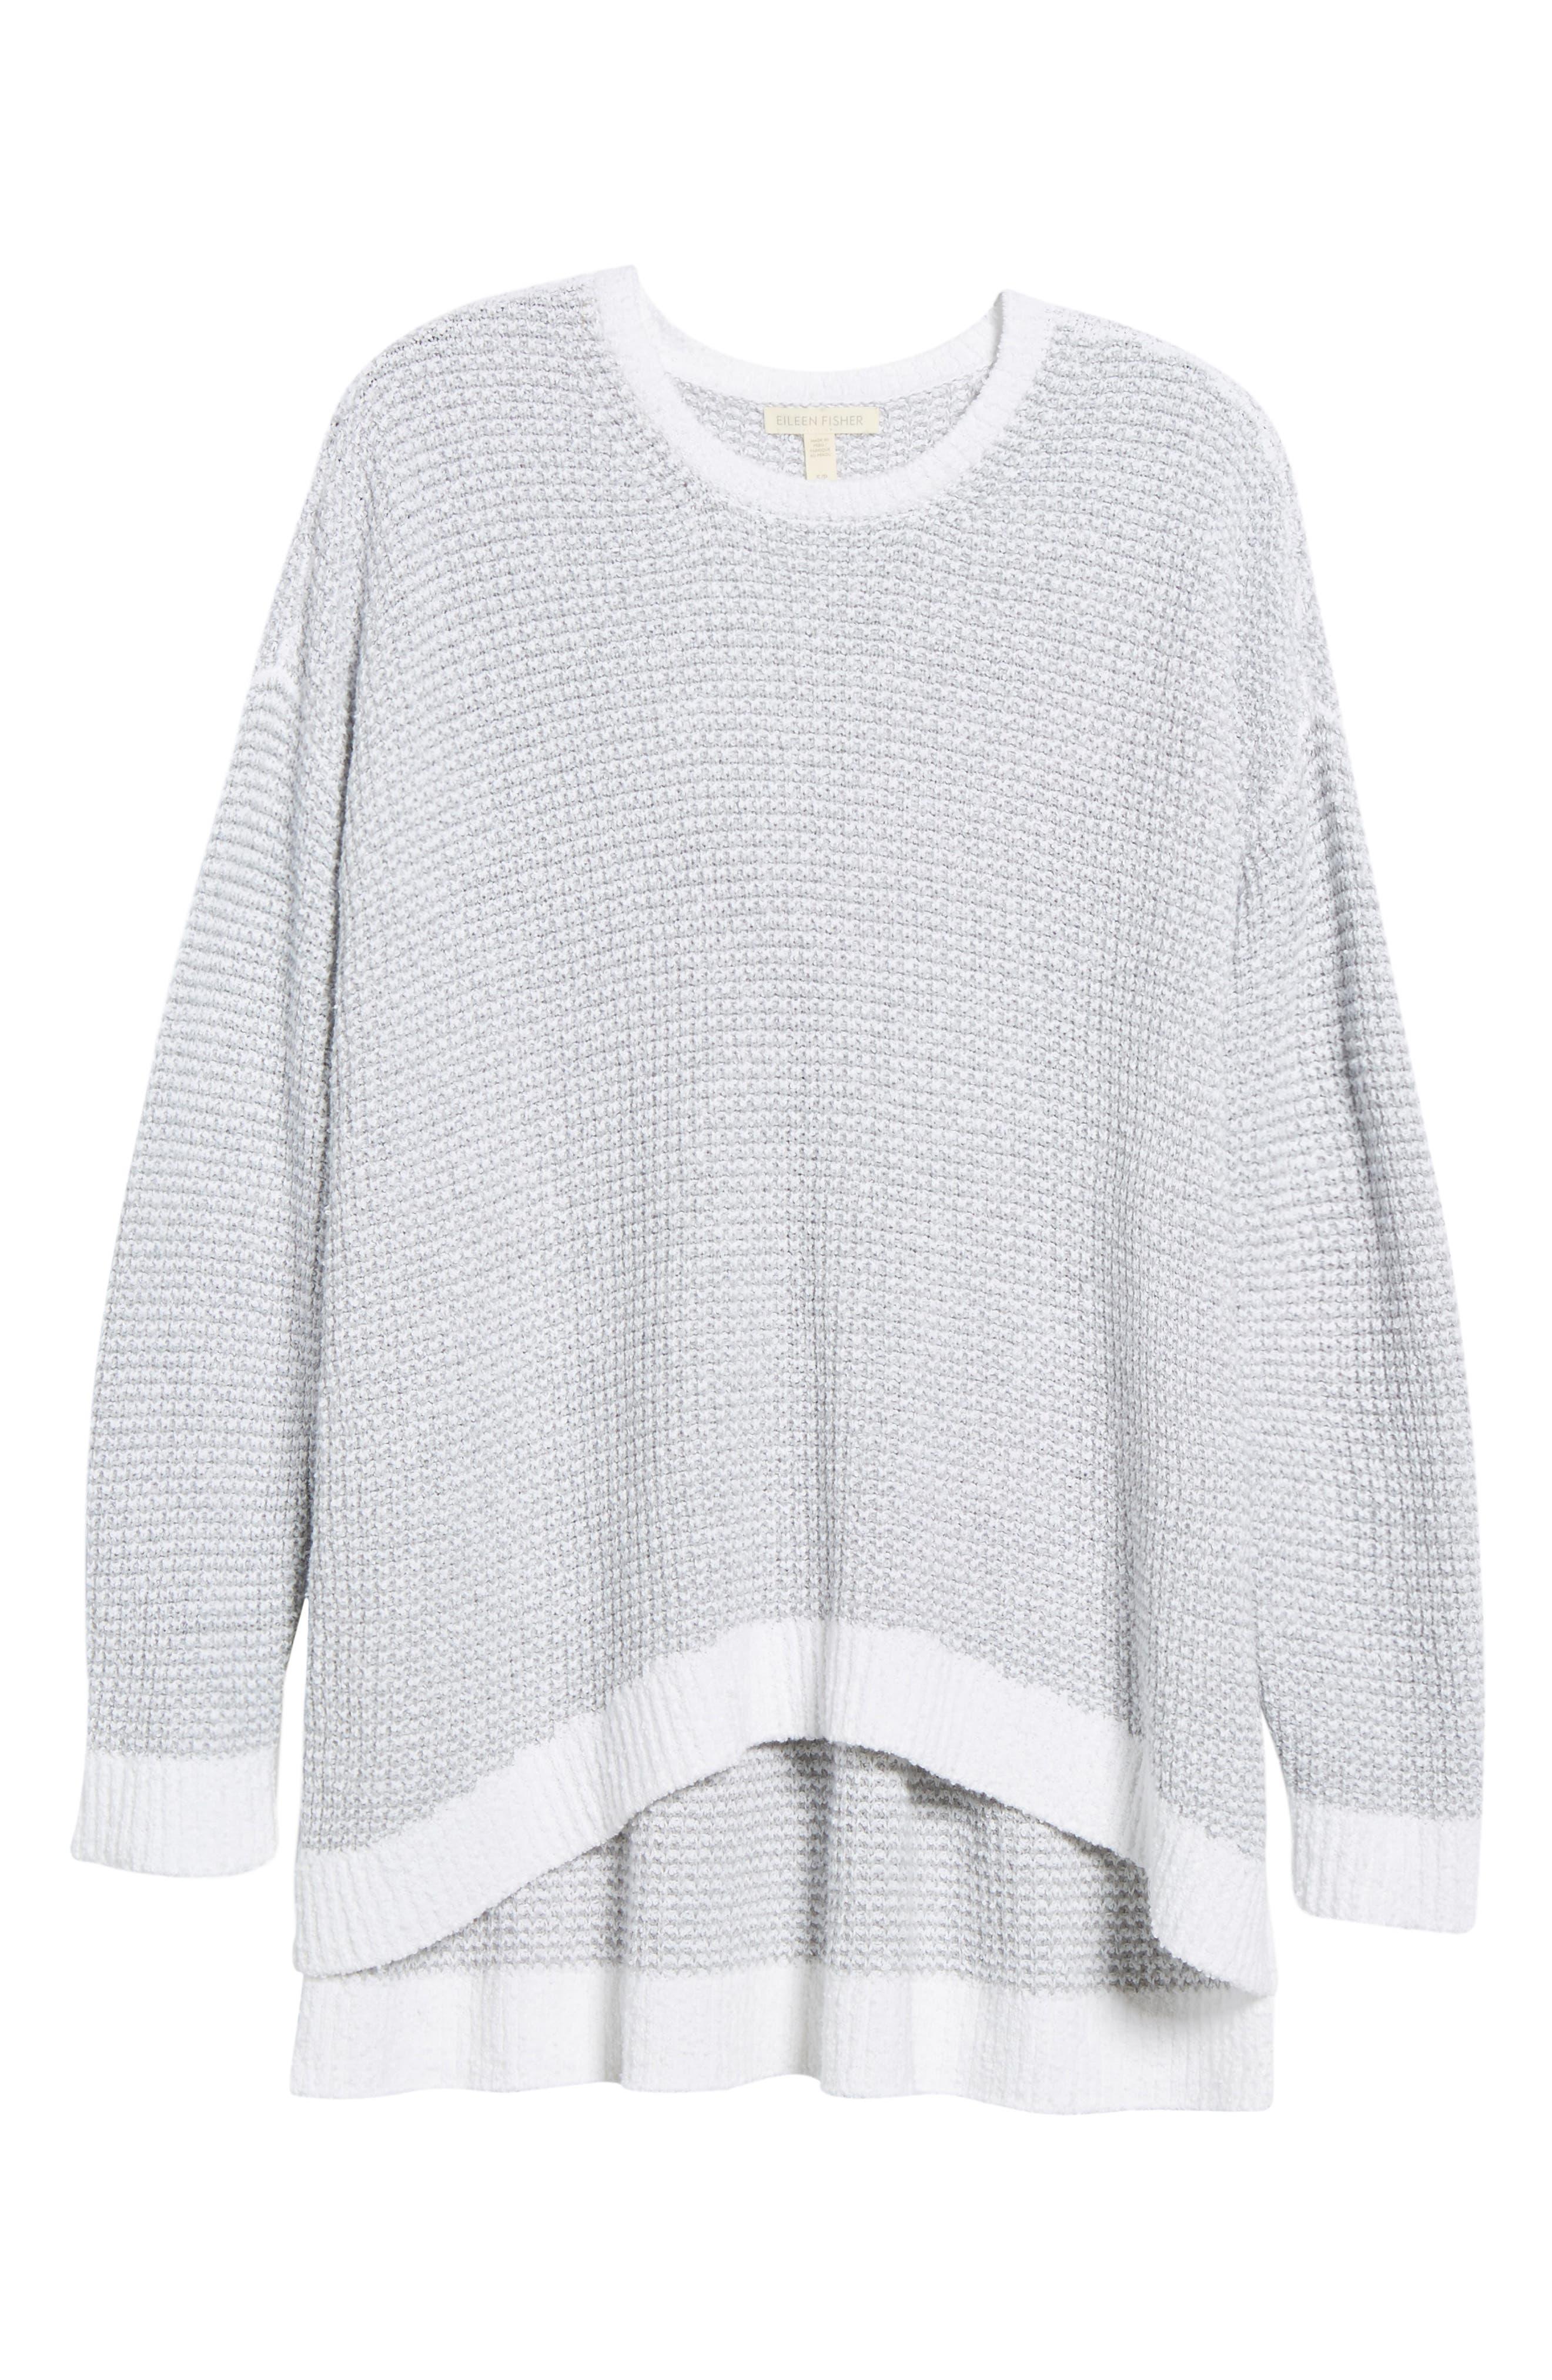 Waffled Organic Cotton Sweater,                             Alternate thumbnail 6, color,                             Dark Pearl